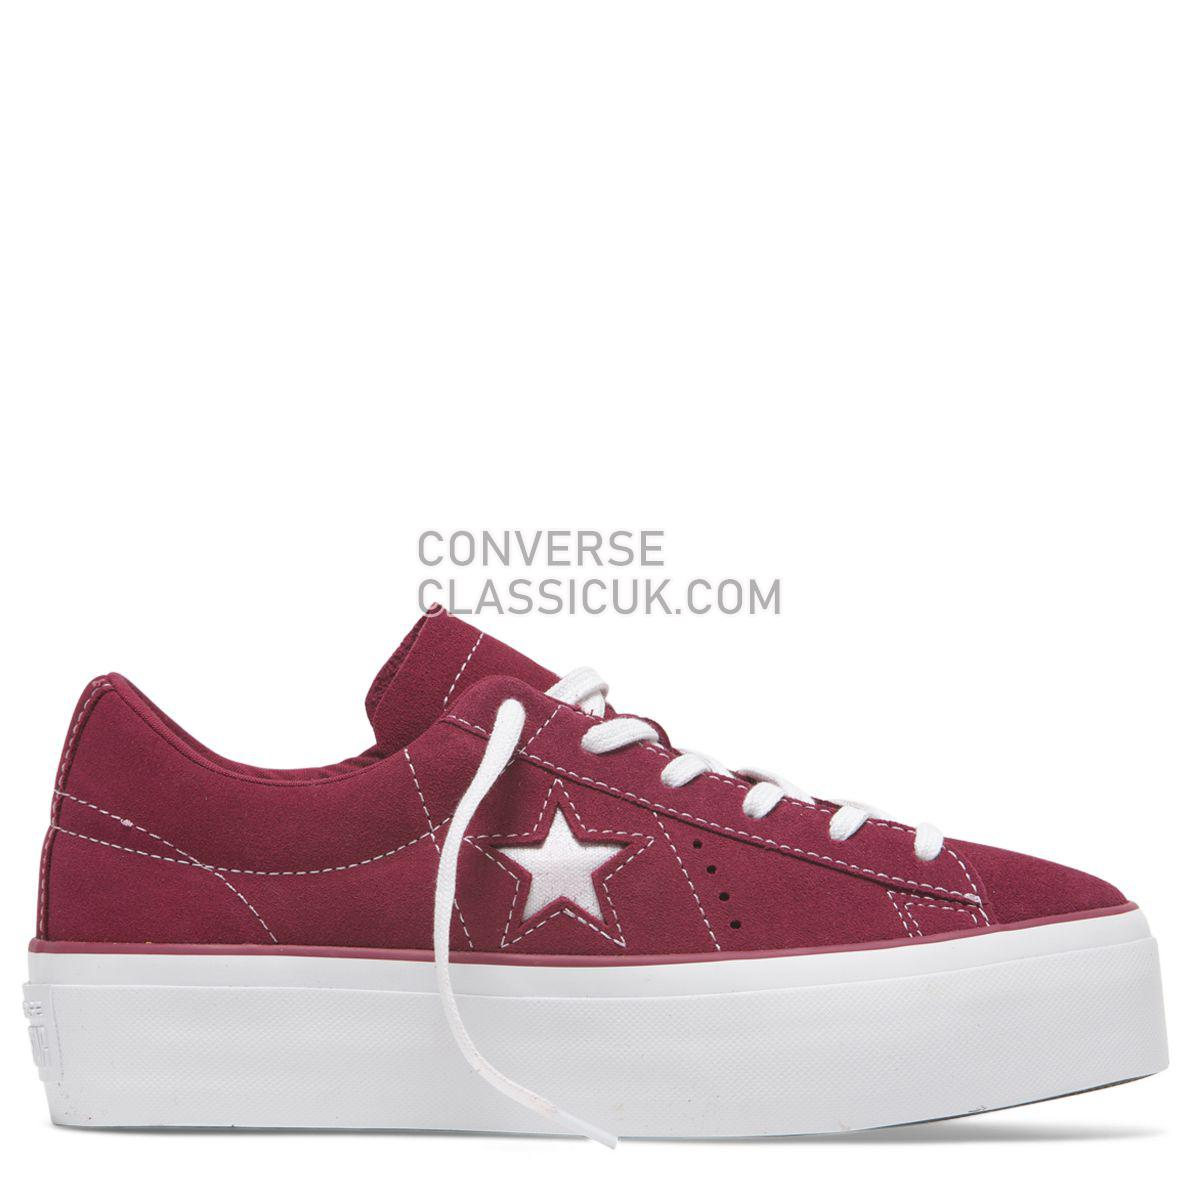 Converse One Star Platform Low Top Field Rhubarb Womens 563488 Rhubarb/White/White Shoes